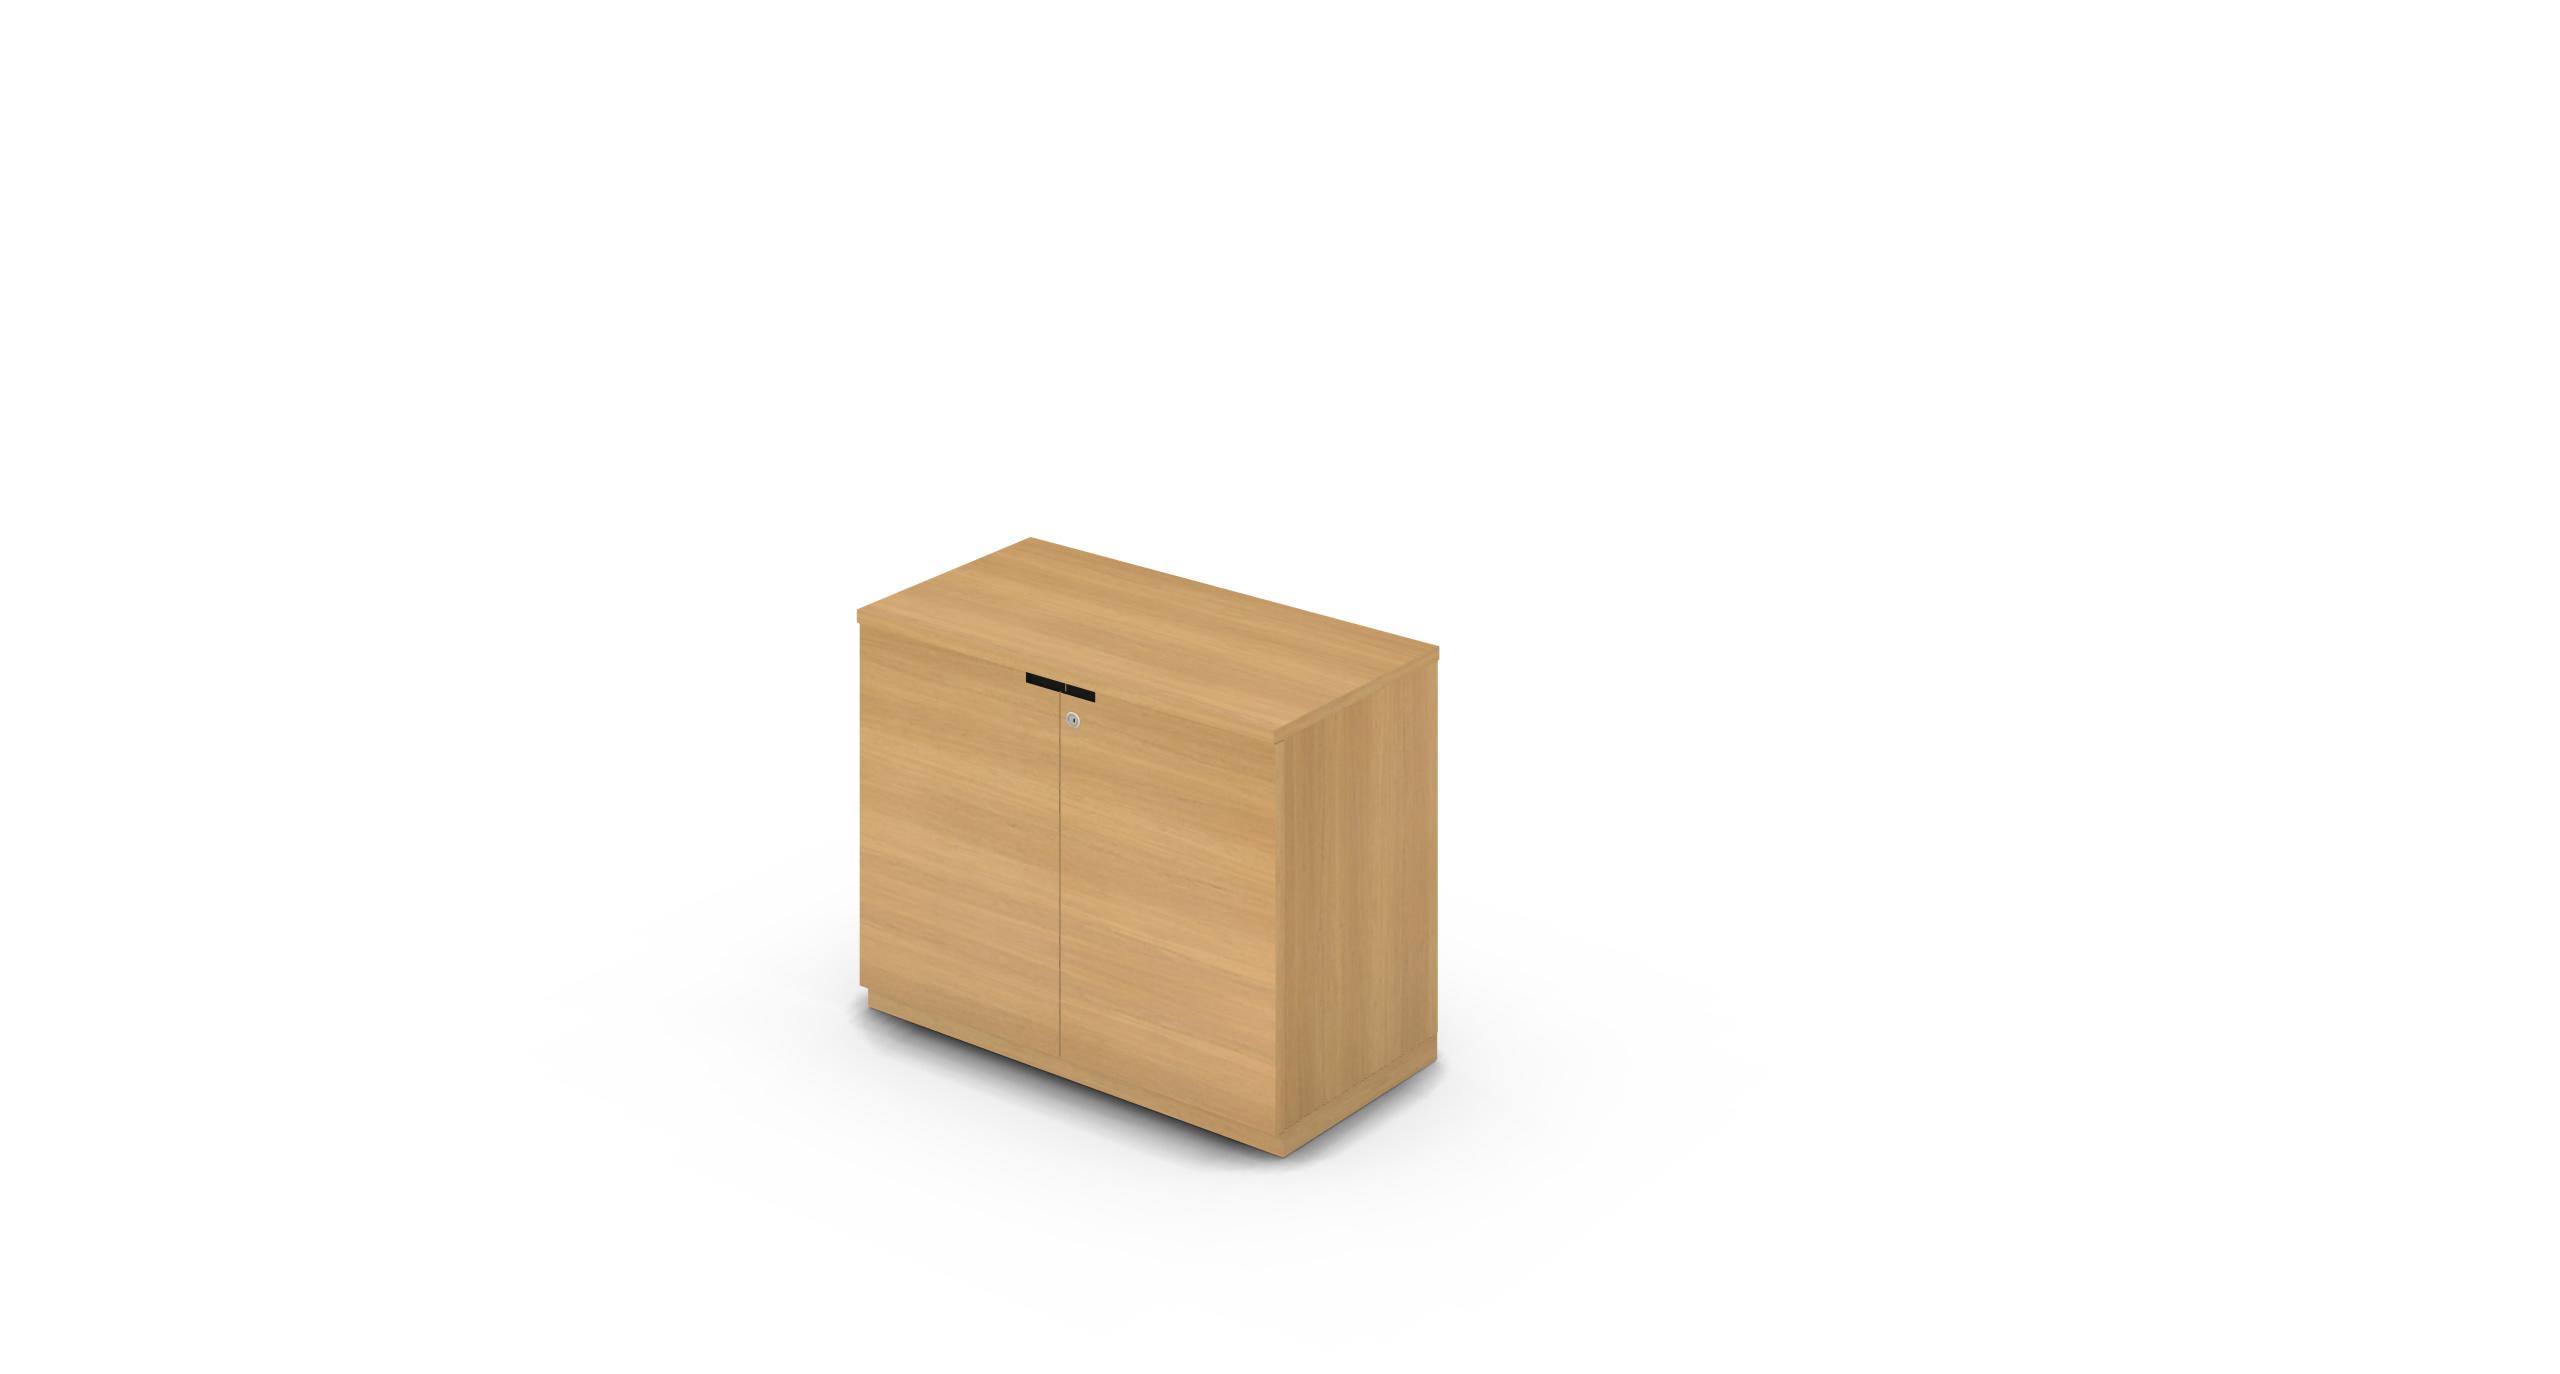 Cabinet_900x450x775_HD_Oak_CutOut_WithCylinder